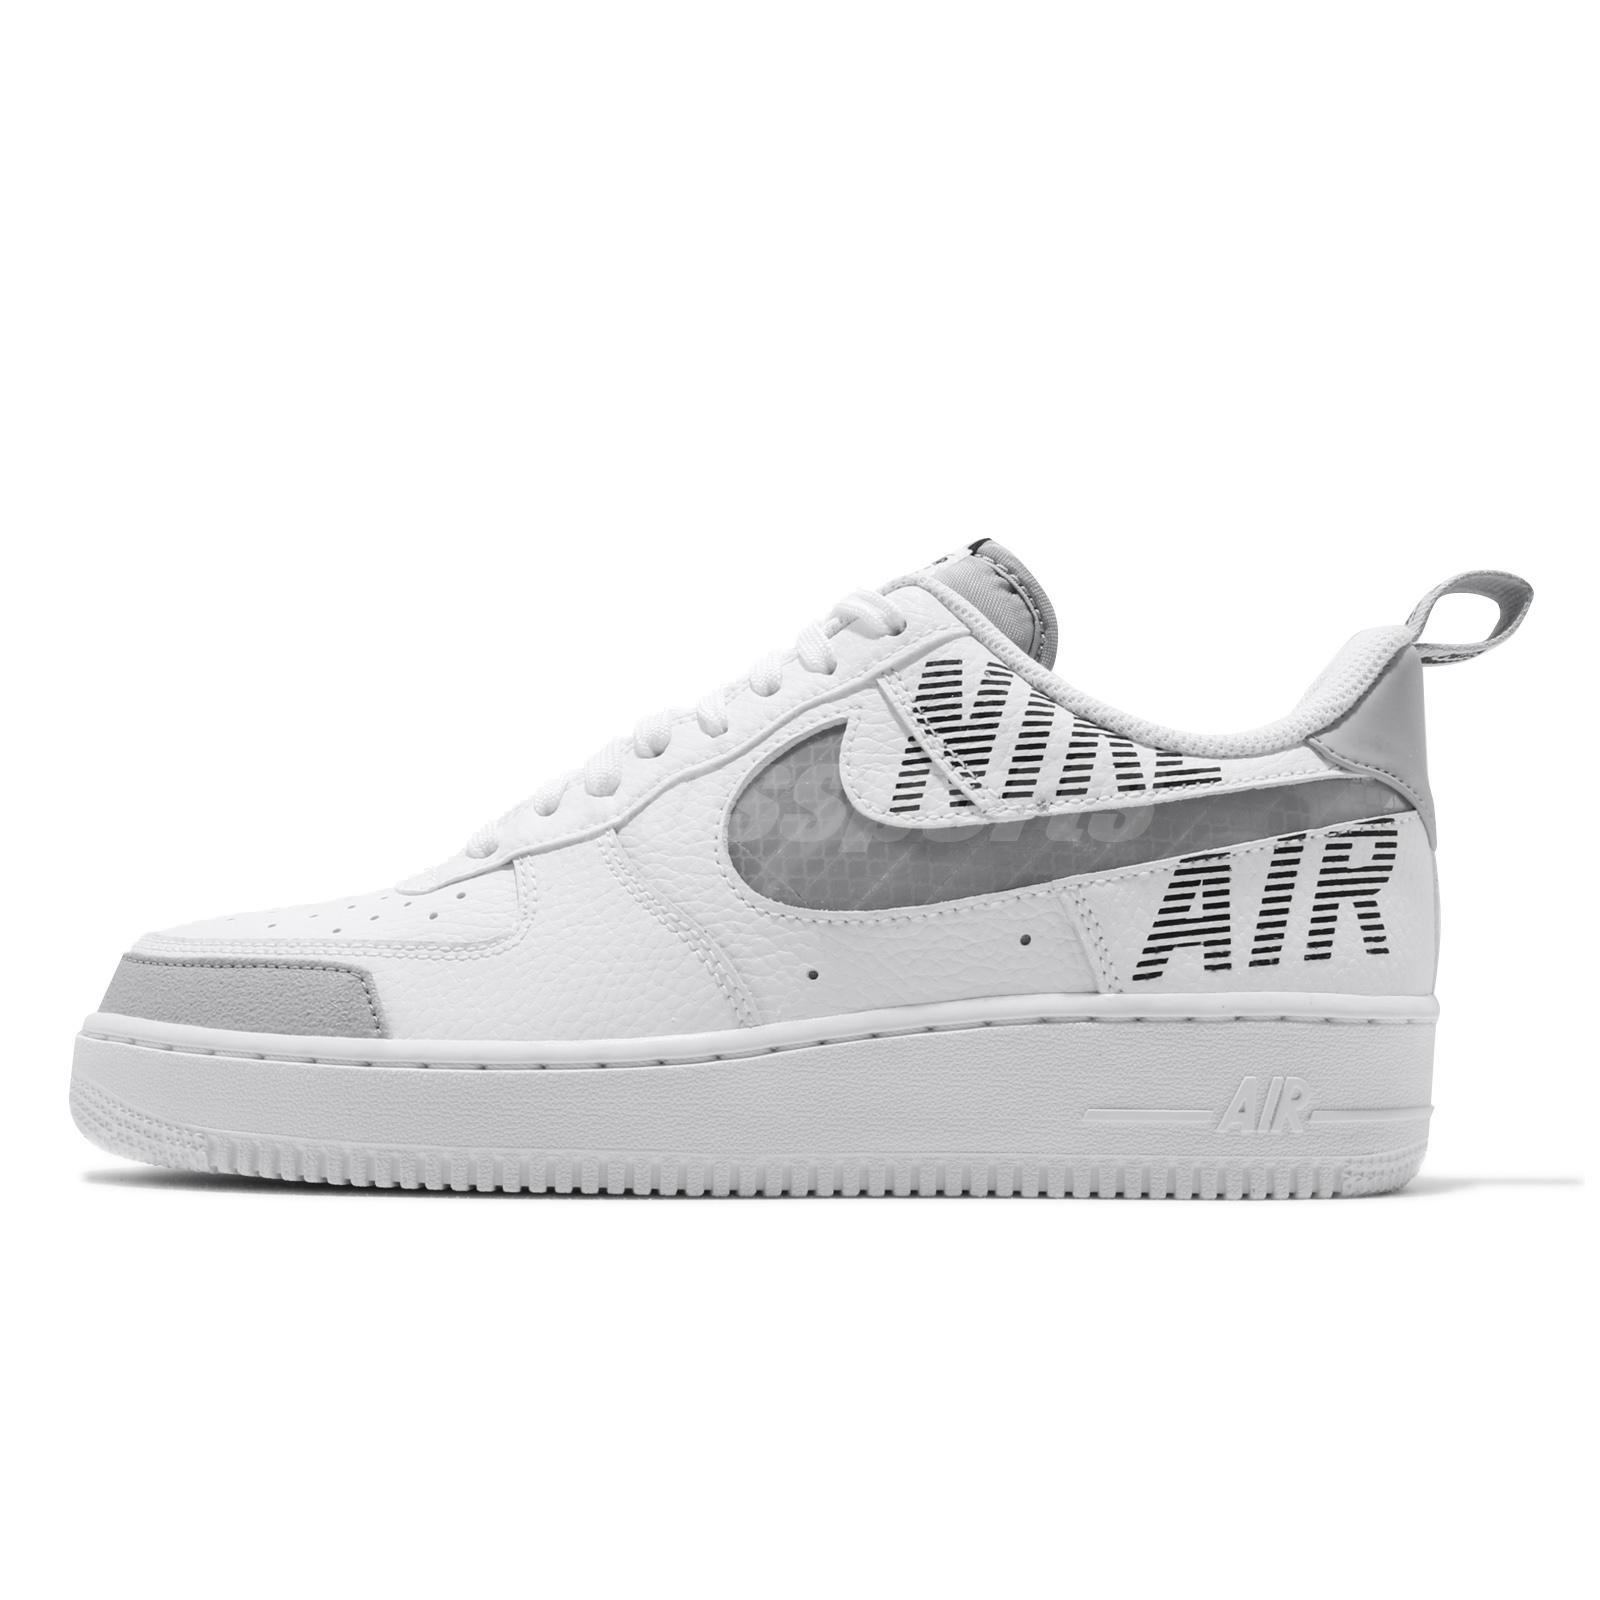 Details about Nike Air Force 1 07 LV8 2 AF1 Under Construction White Grey  Men Shoes BQ4421-100